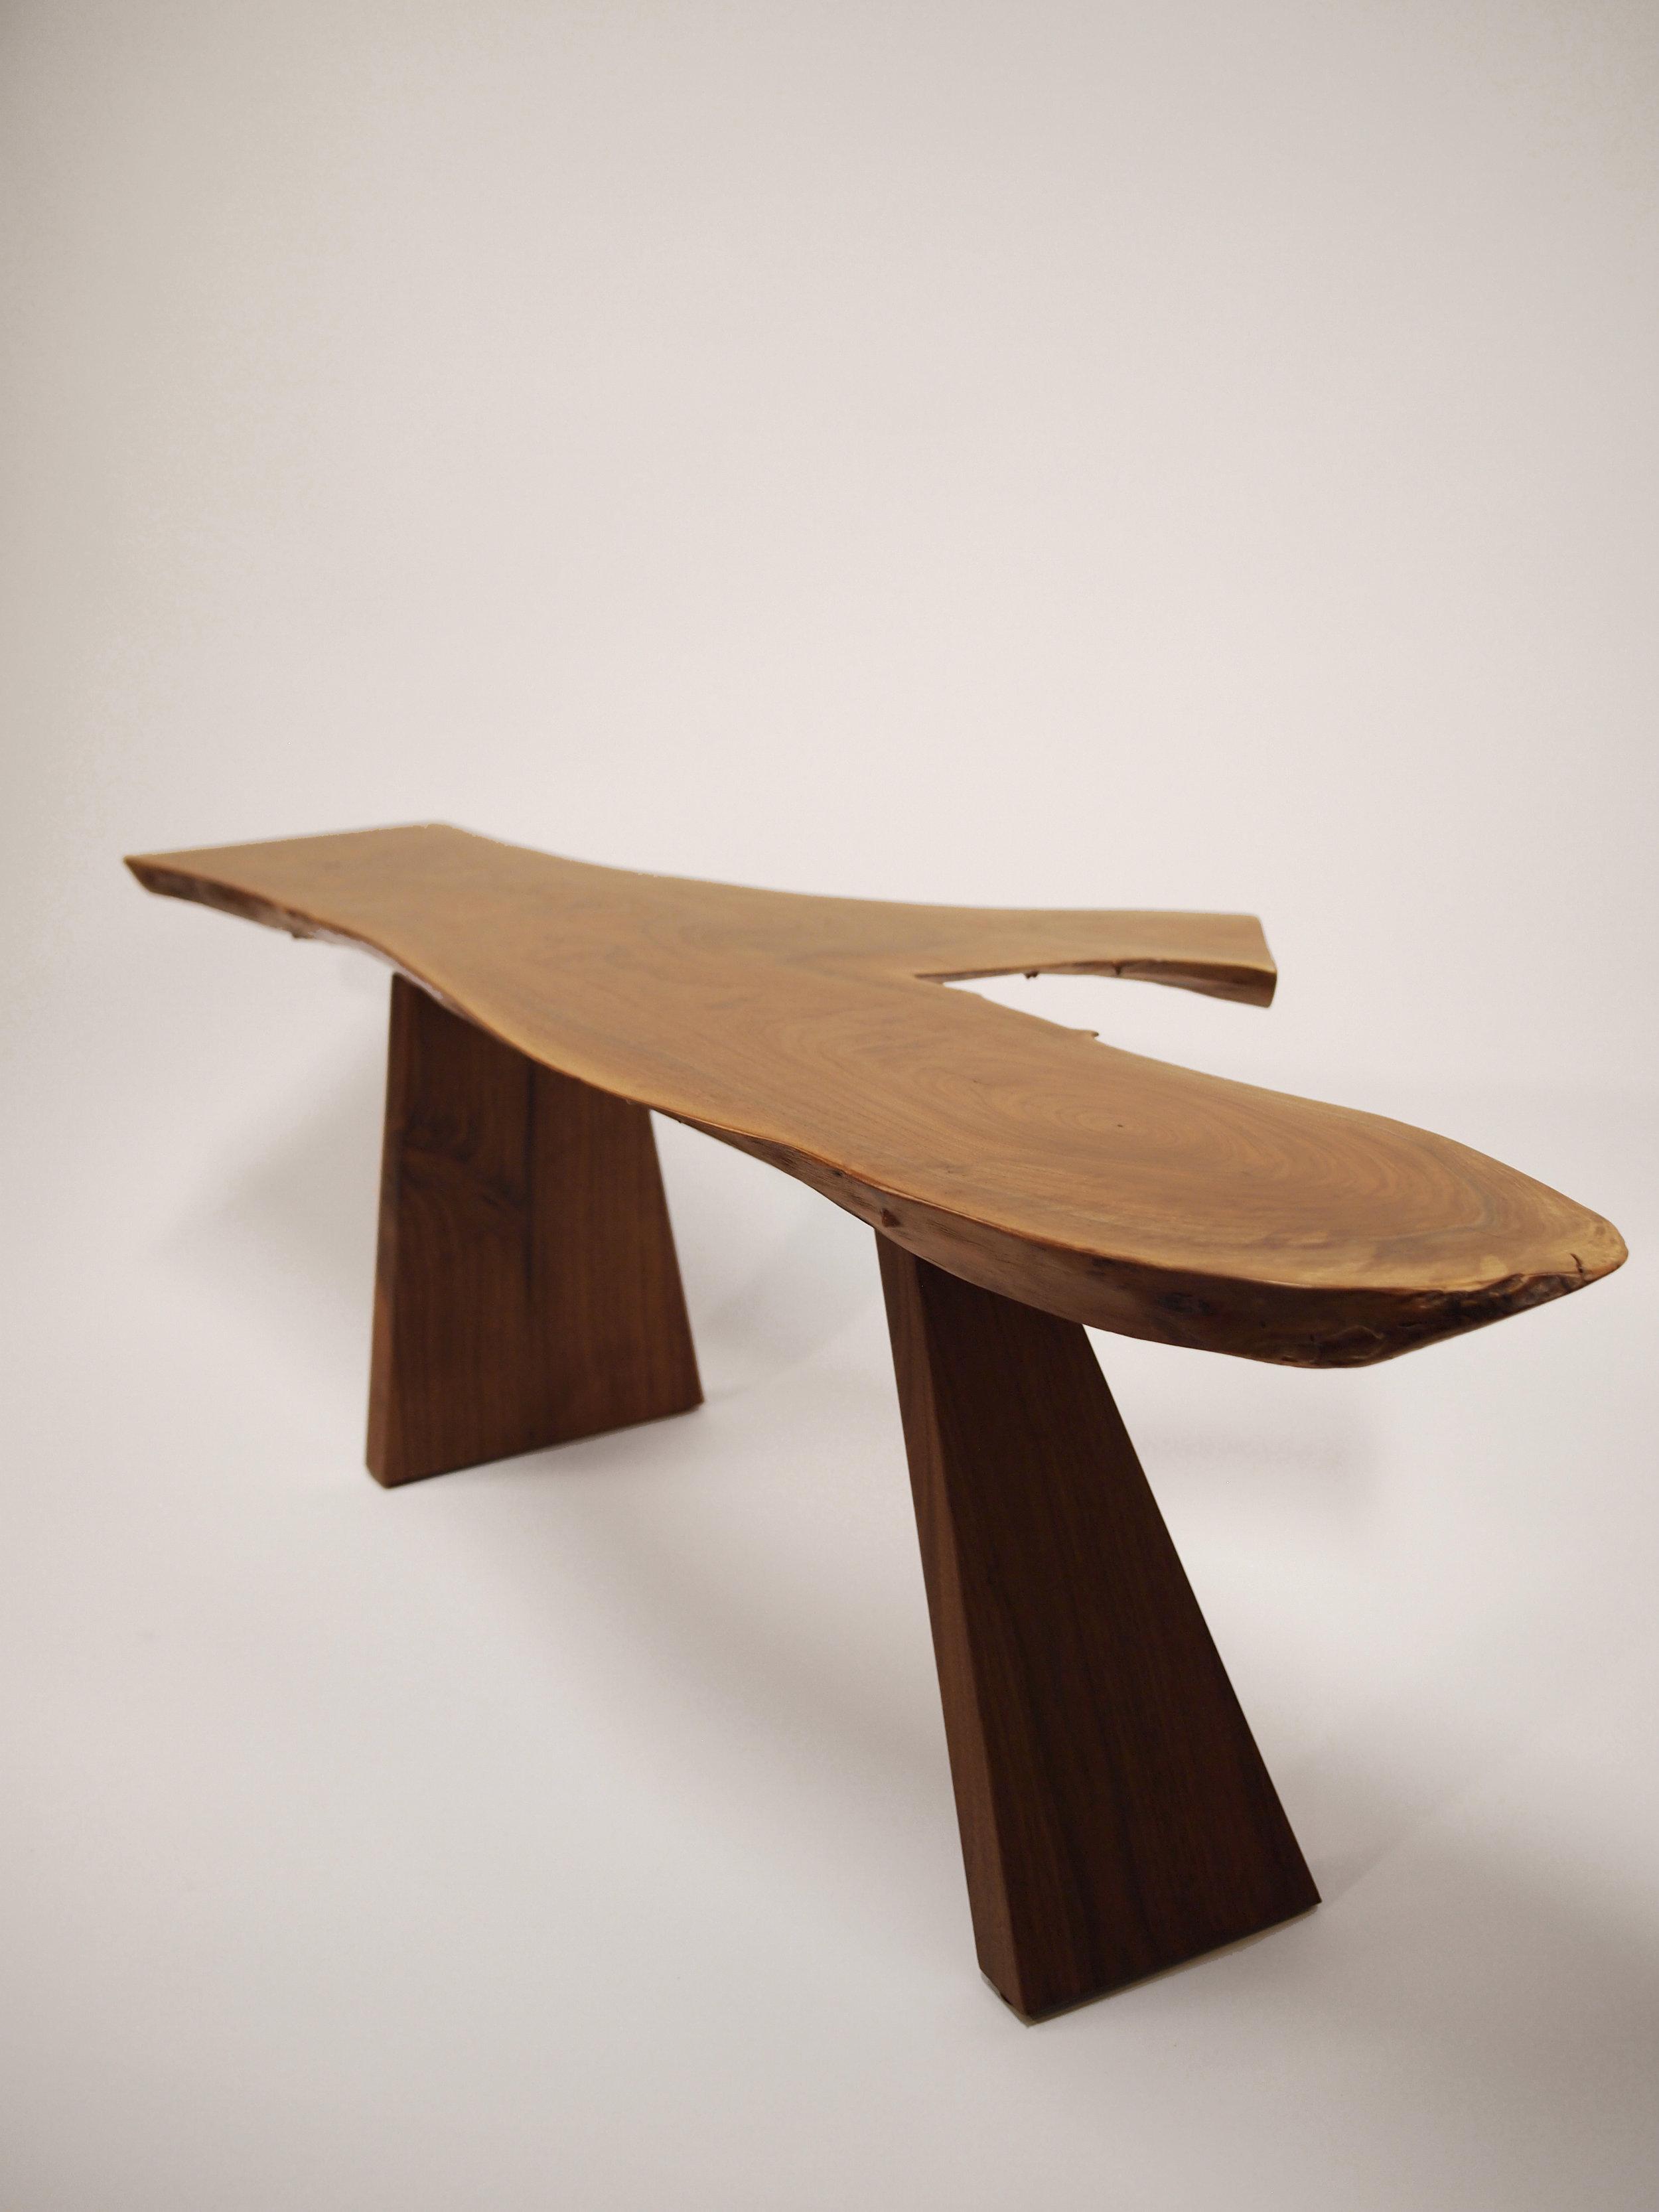 Laurens Cotten wood table.jpg